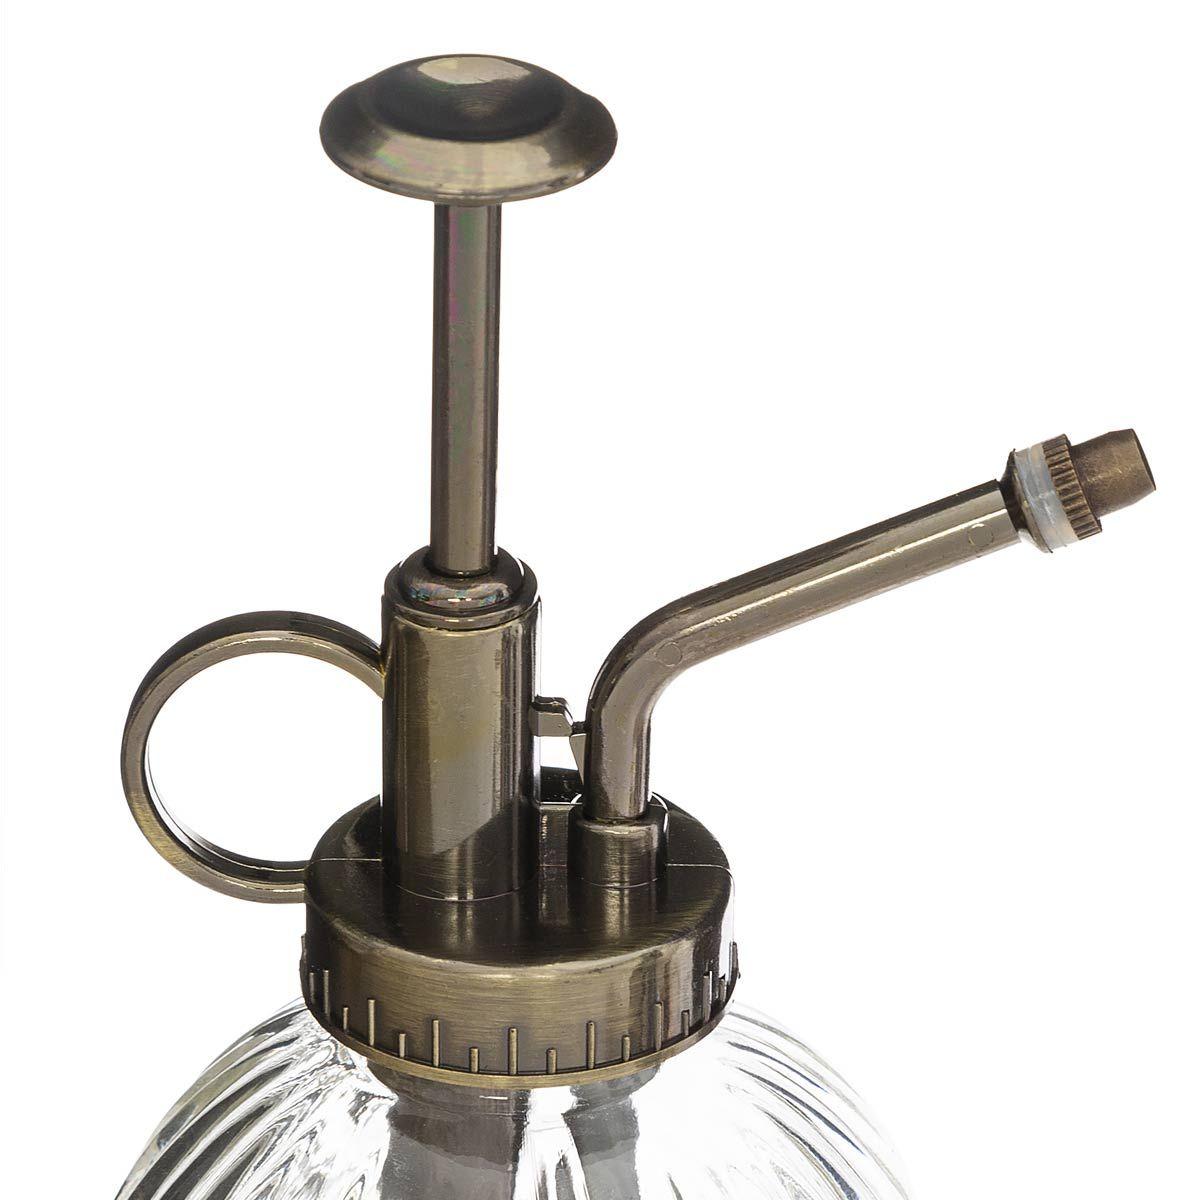 Pulvérisateur vintage en verre